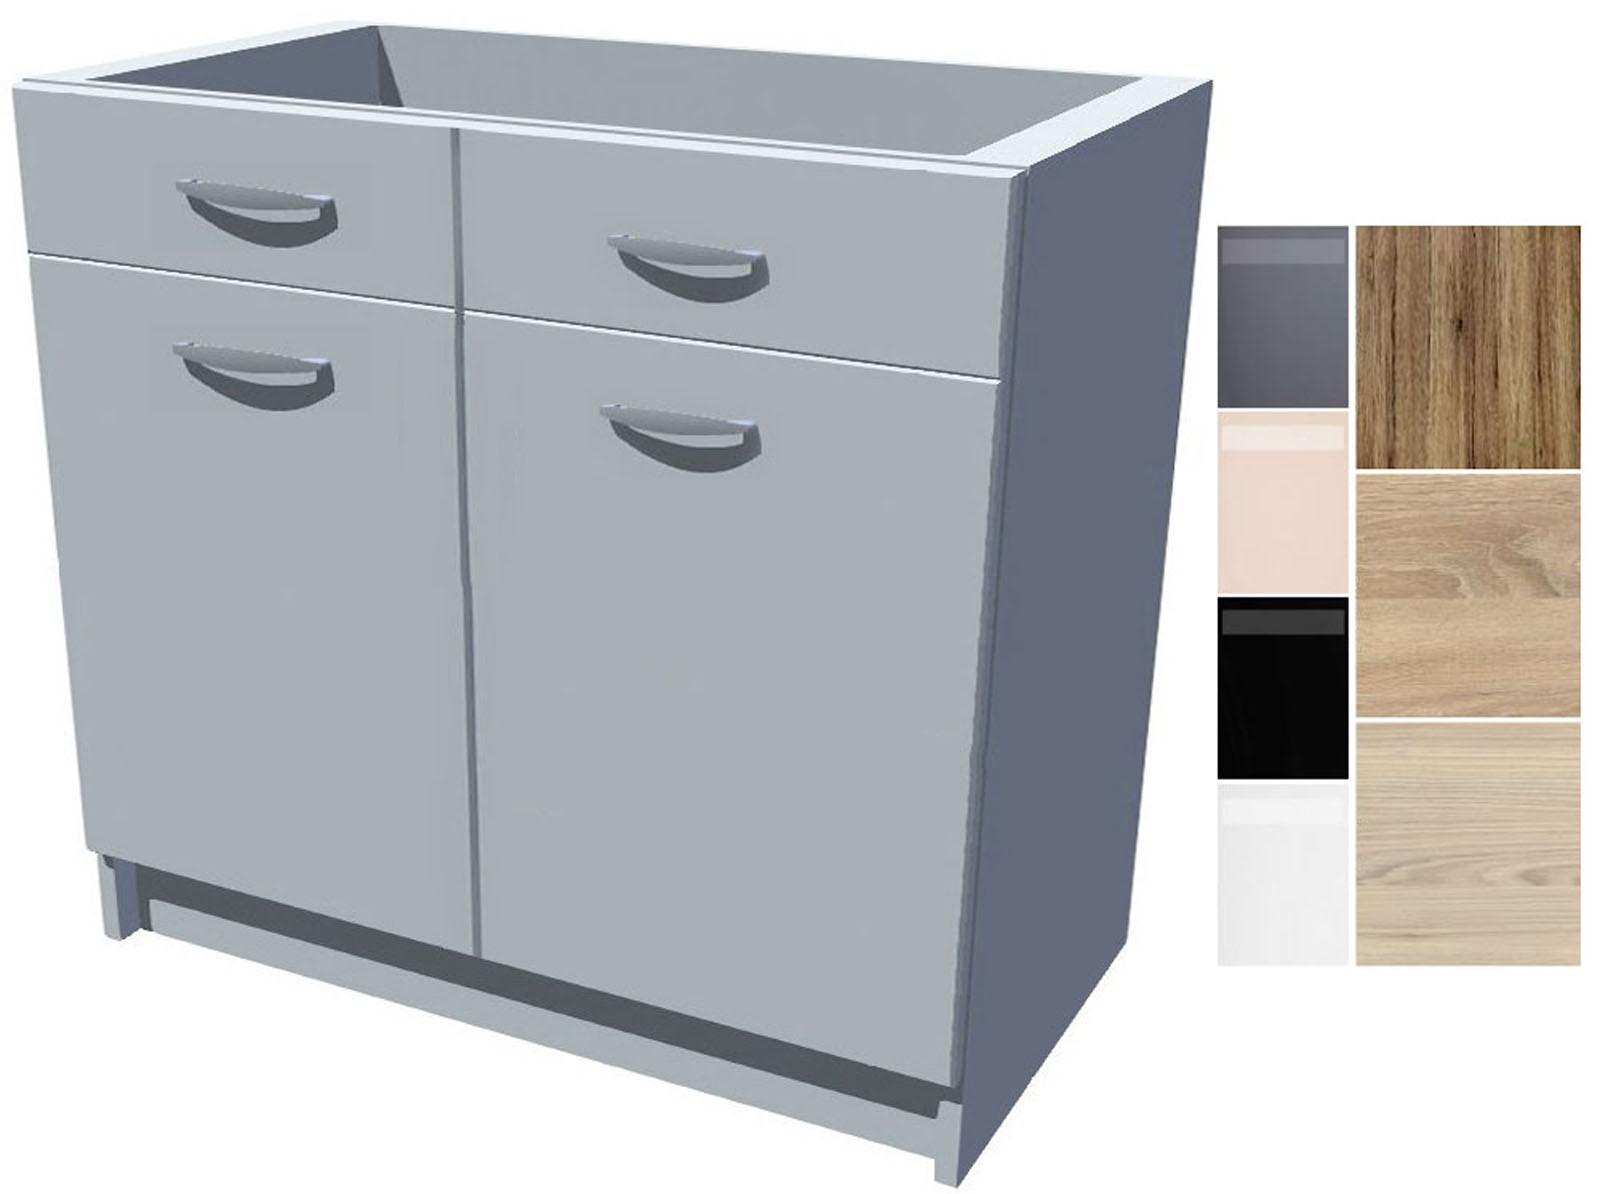 Dřezová kuchyňská skříňka Iga 2D 90 cm